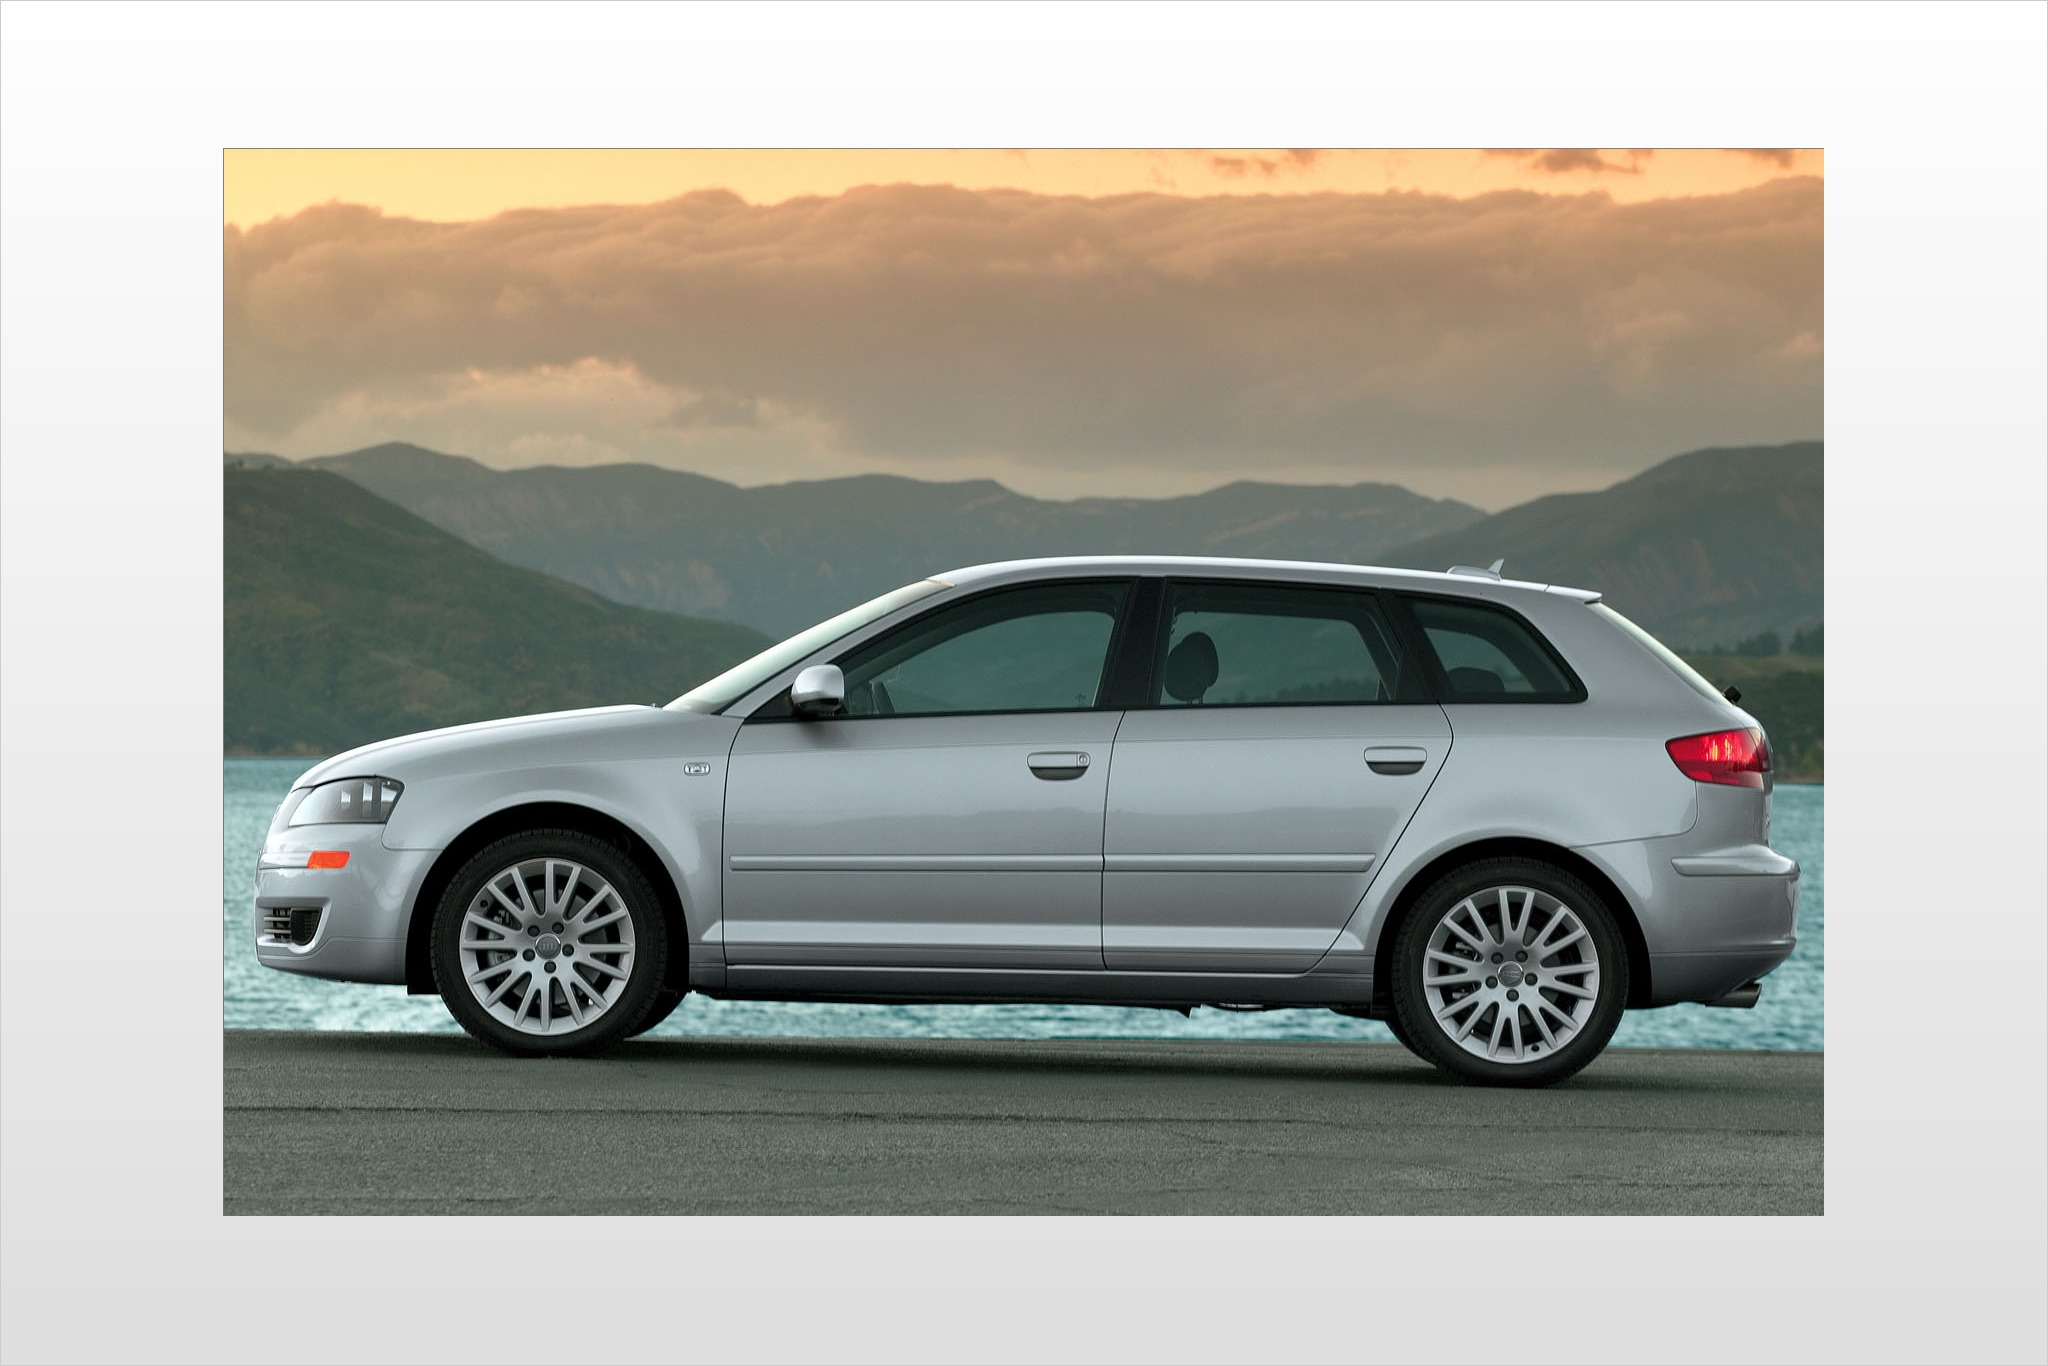 2007 Audi A3 Image 6